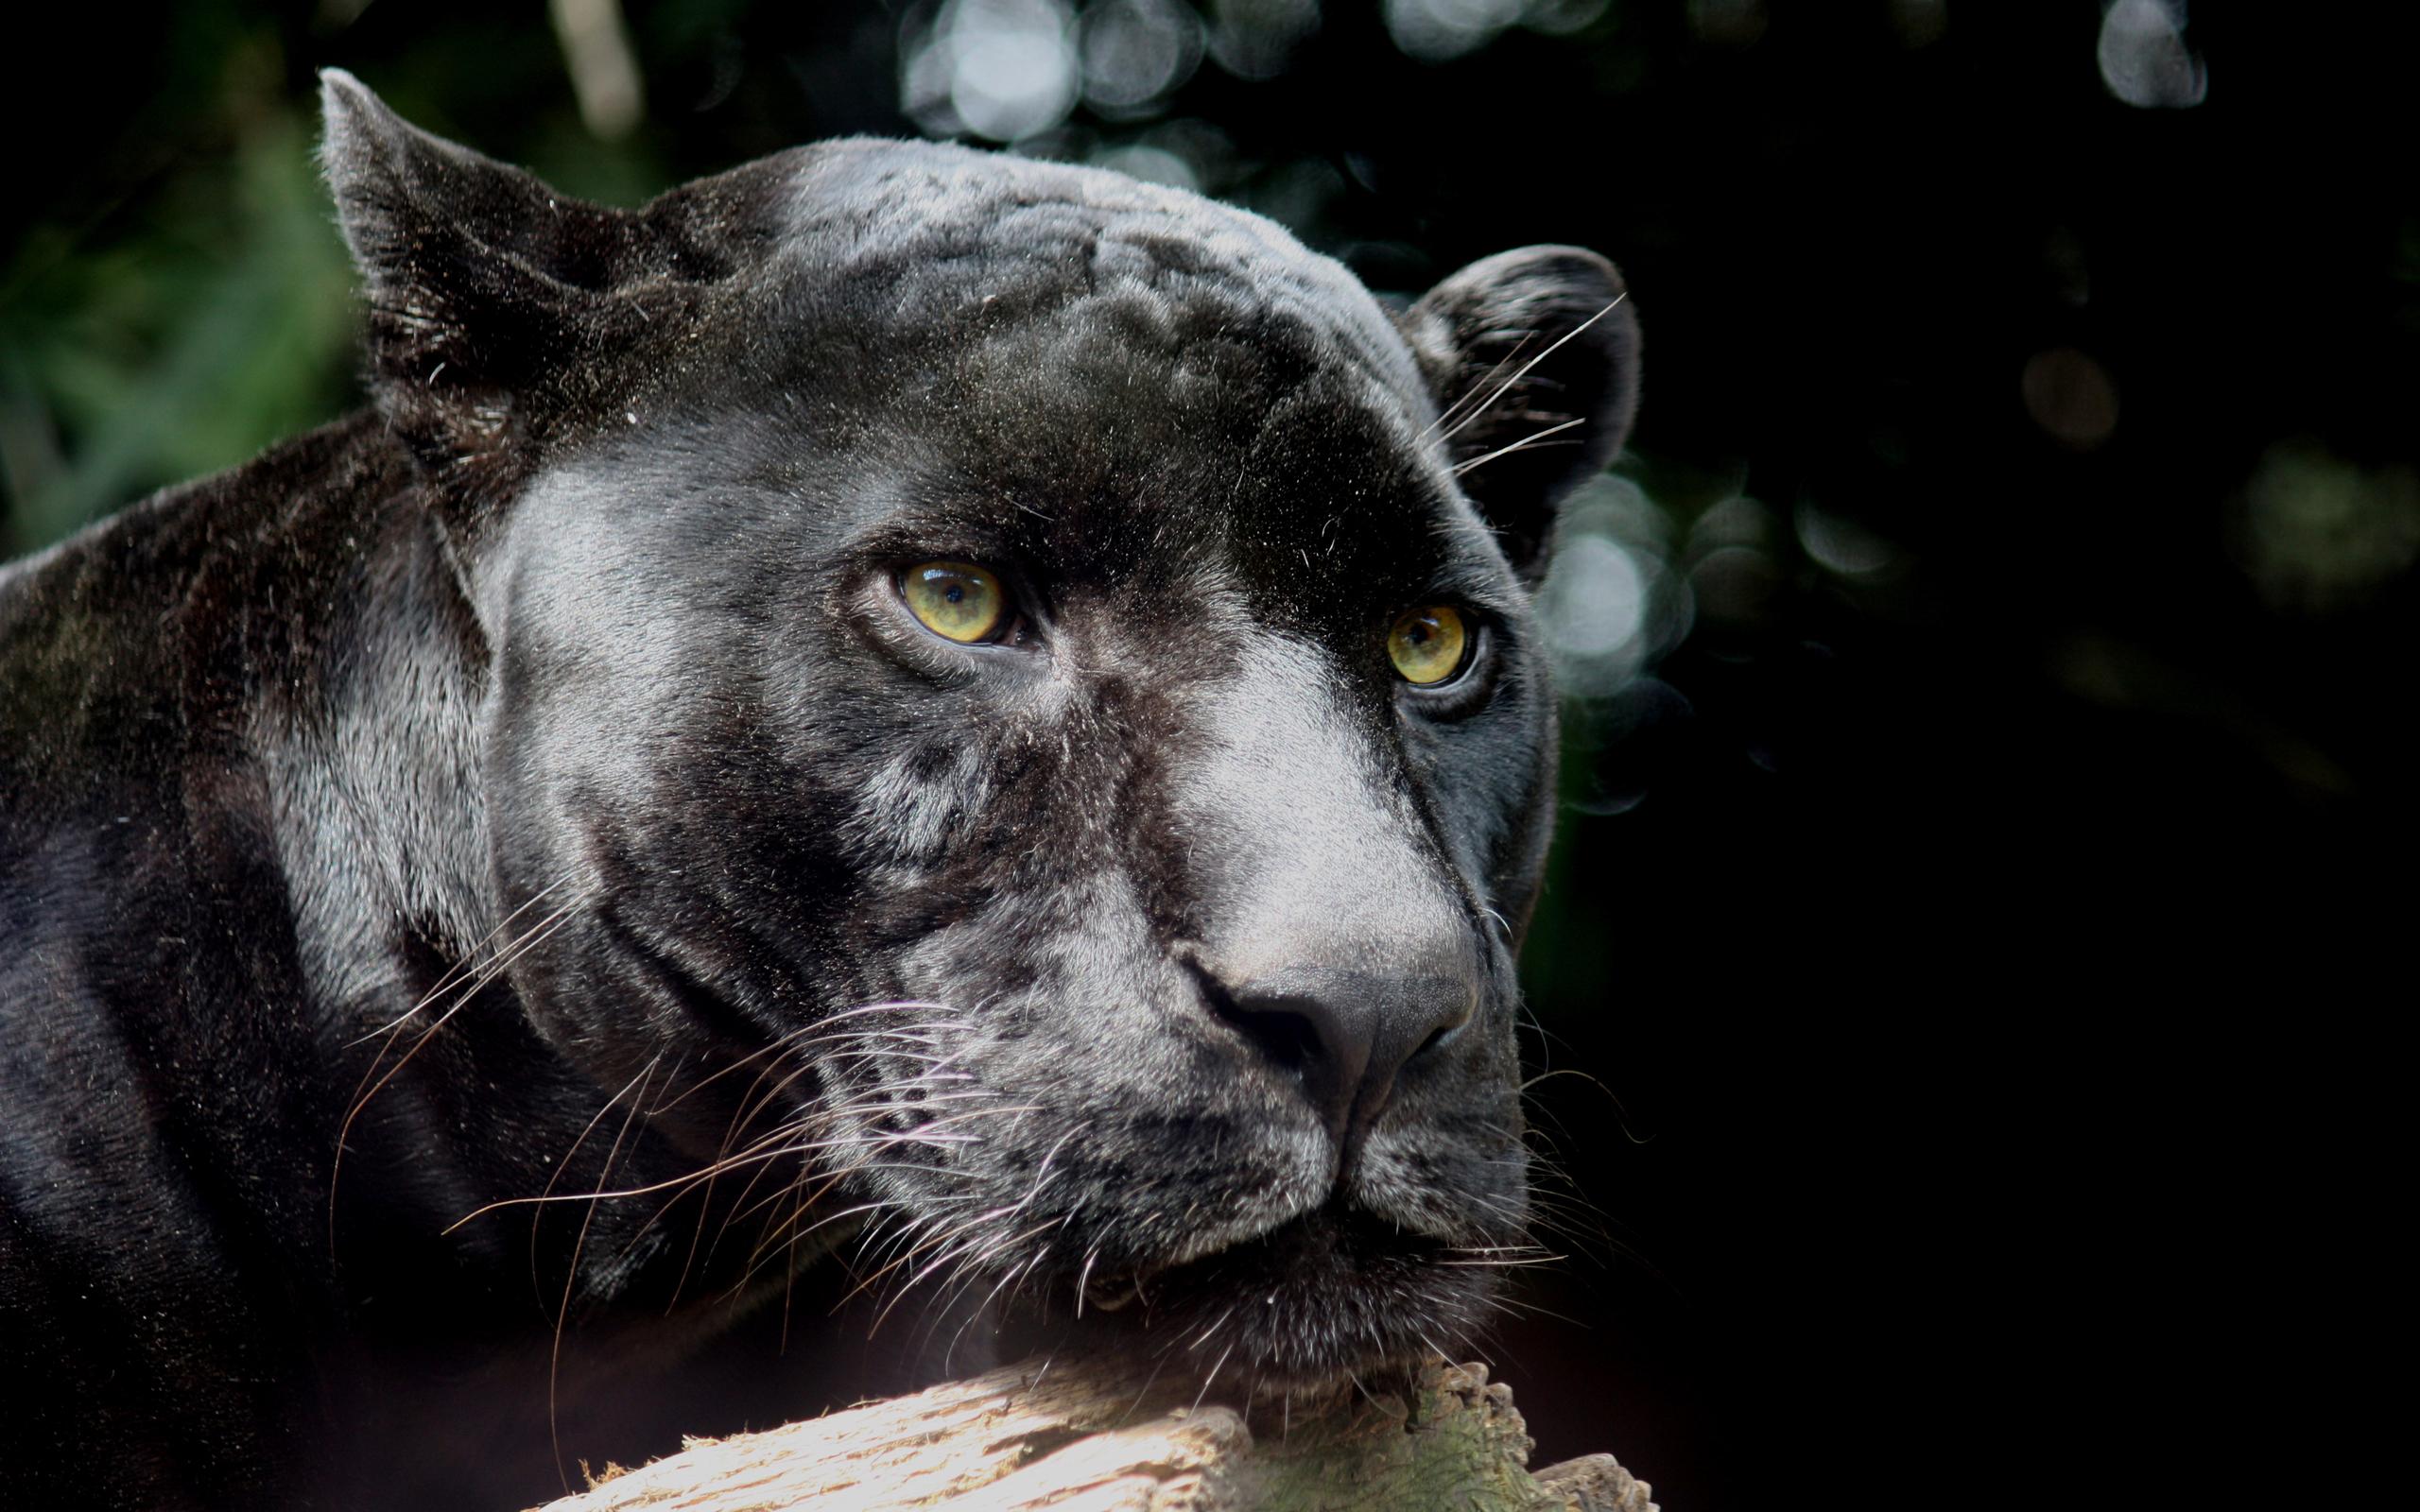 Black Panther HD Wallpaper | Background Image | 2560x1600 ...